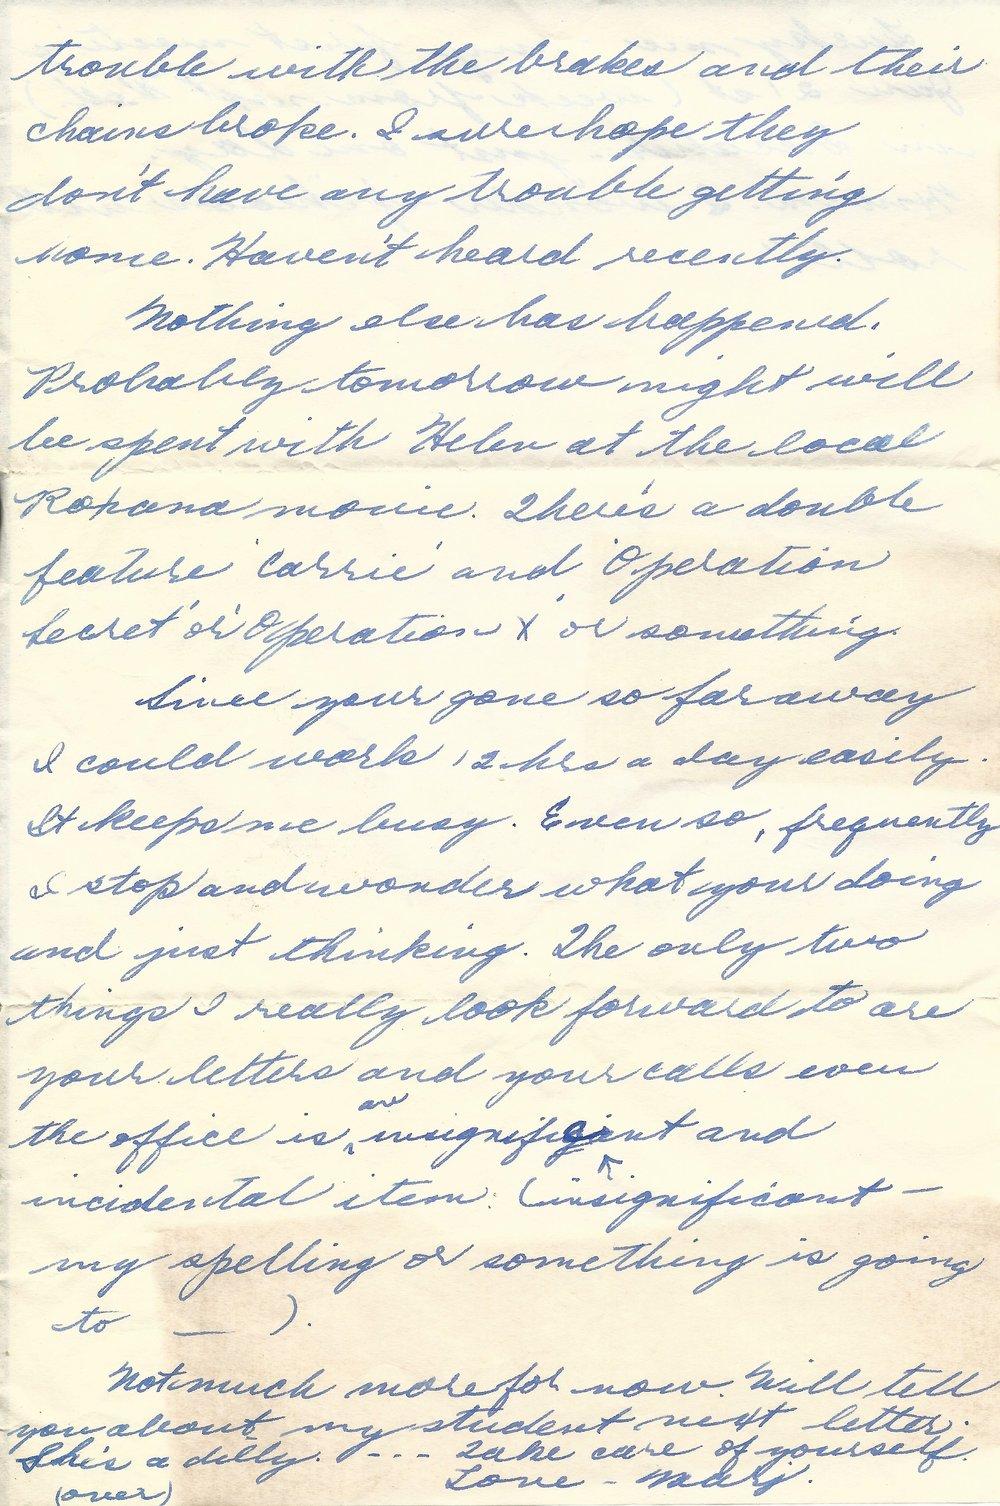 4. Jan. 9, 1953 (Oma)_Page_4.jpg